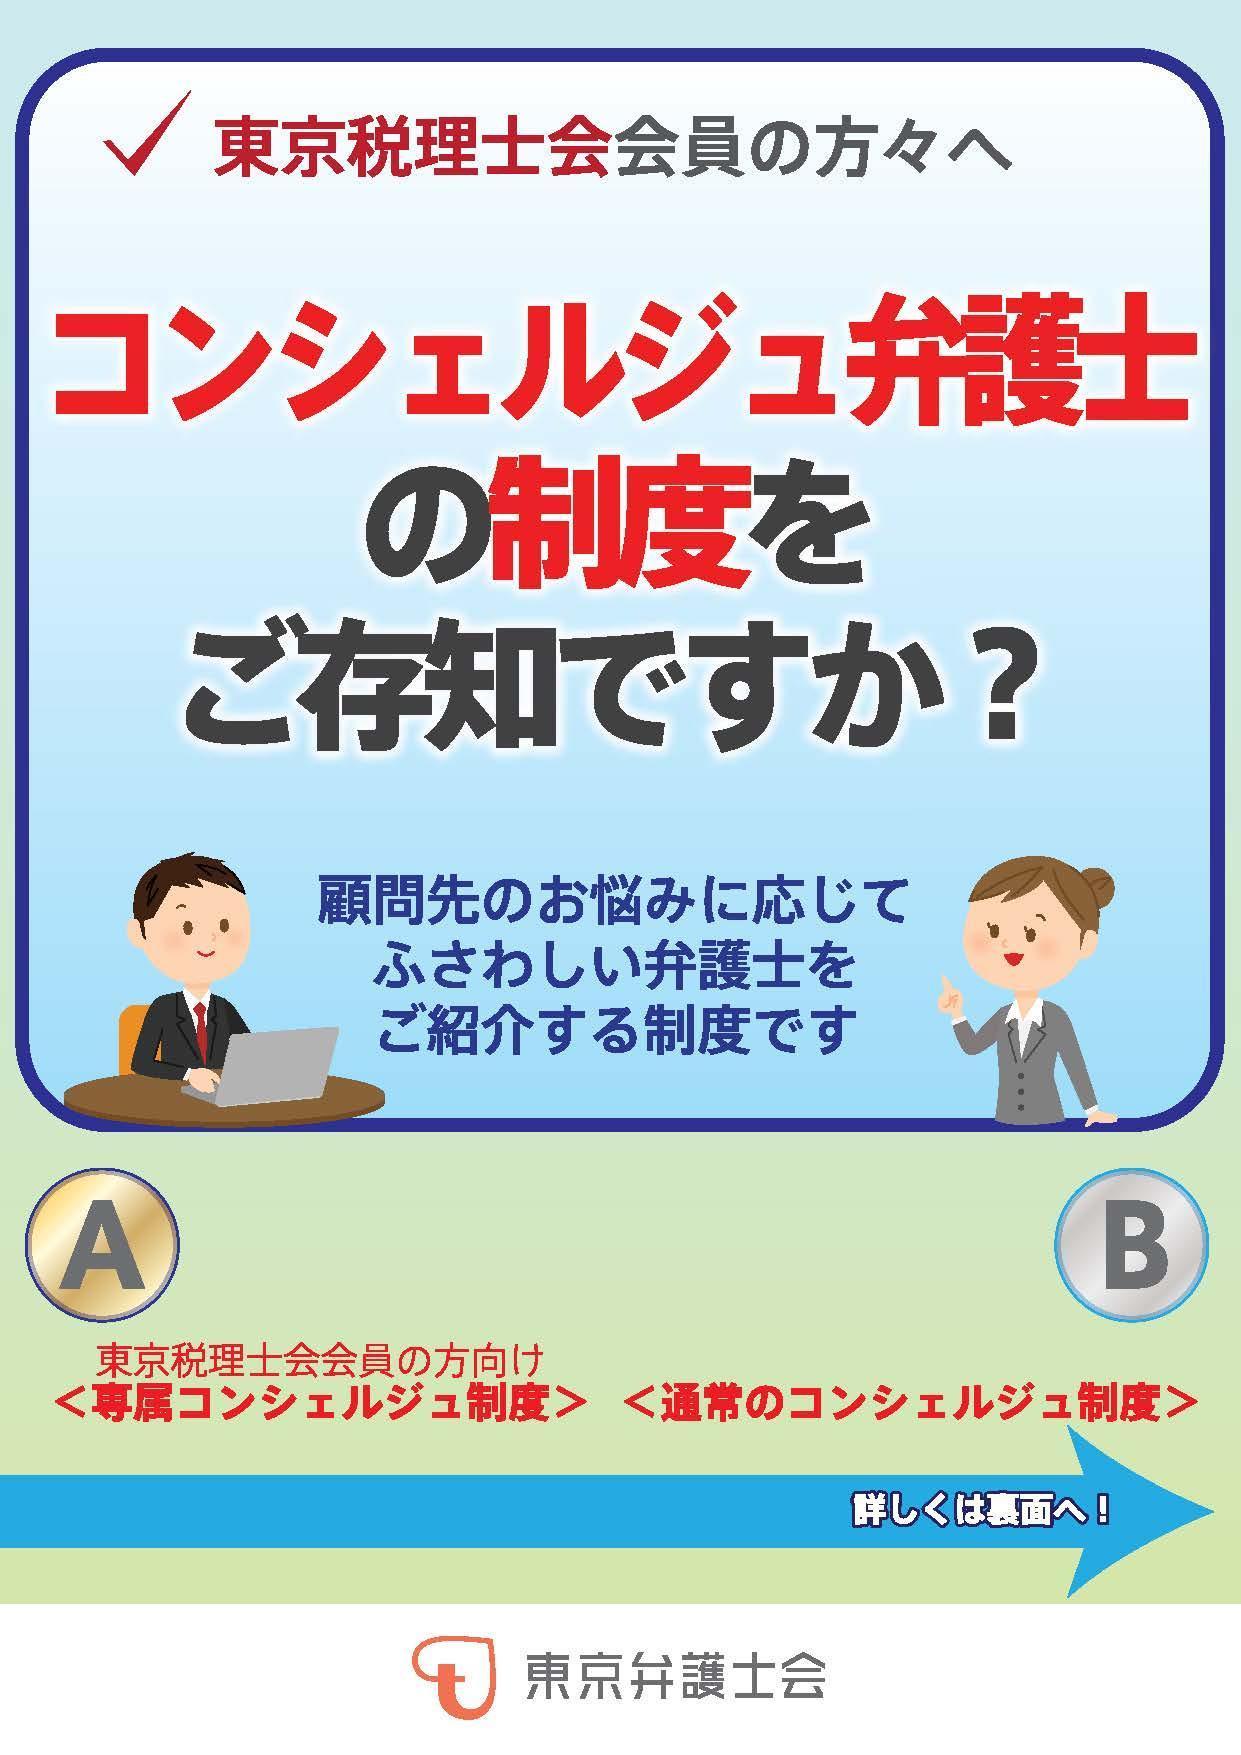 reaflet_zeirishi.jpg